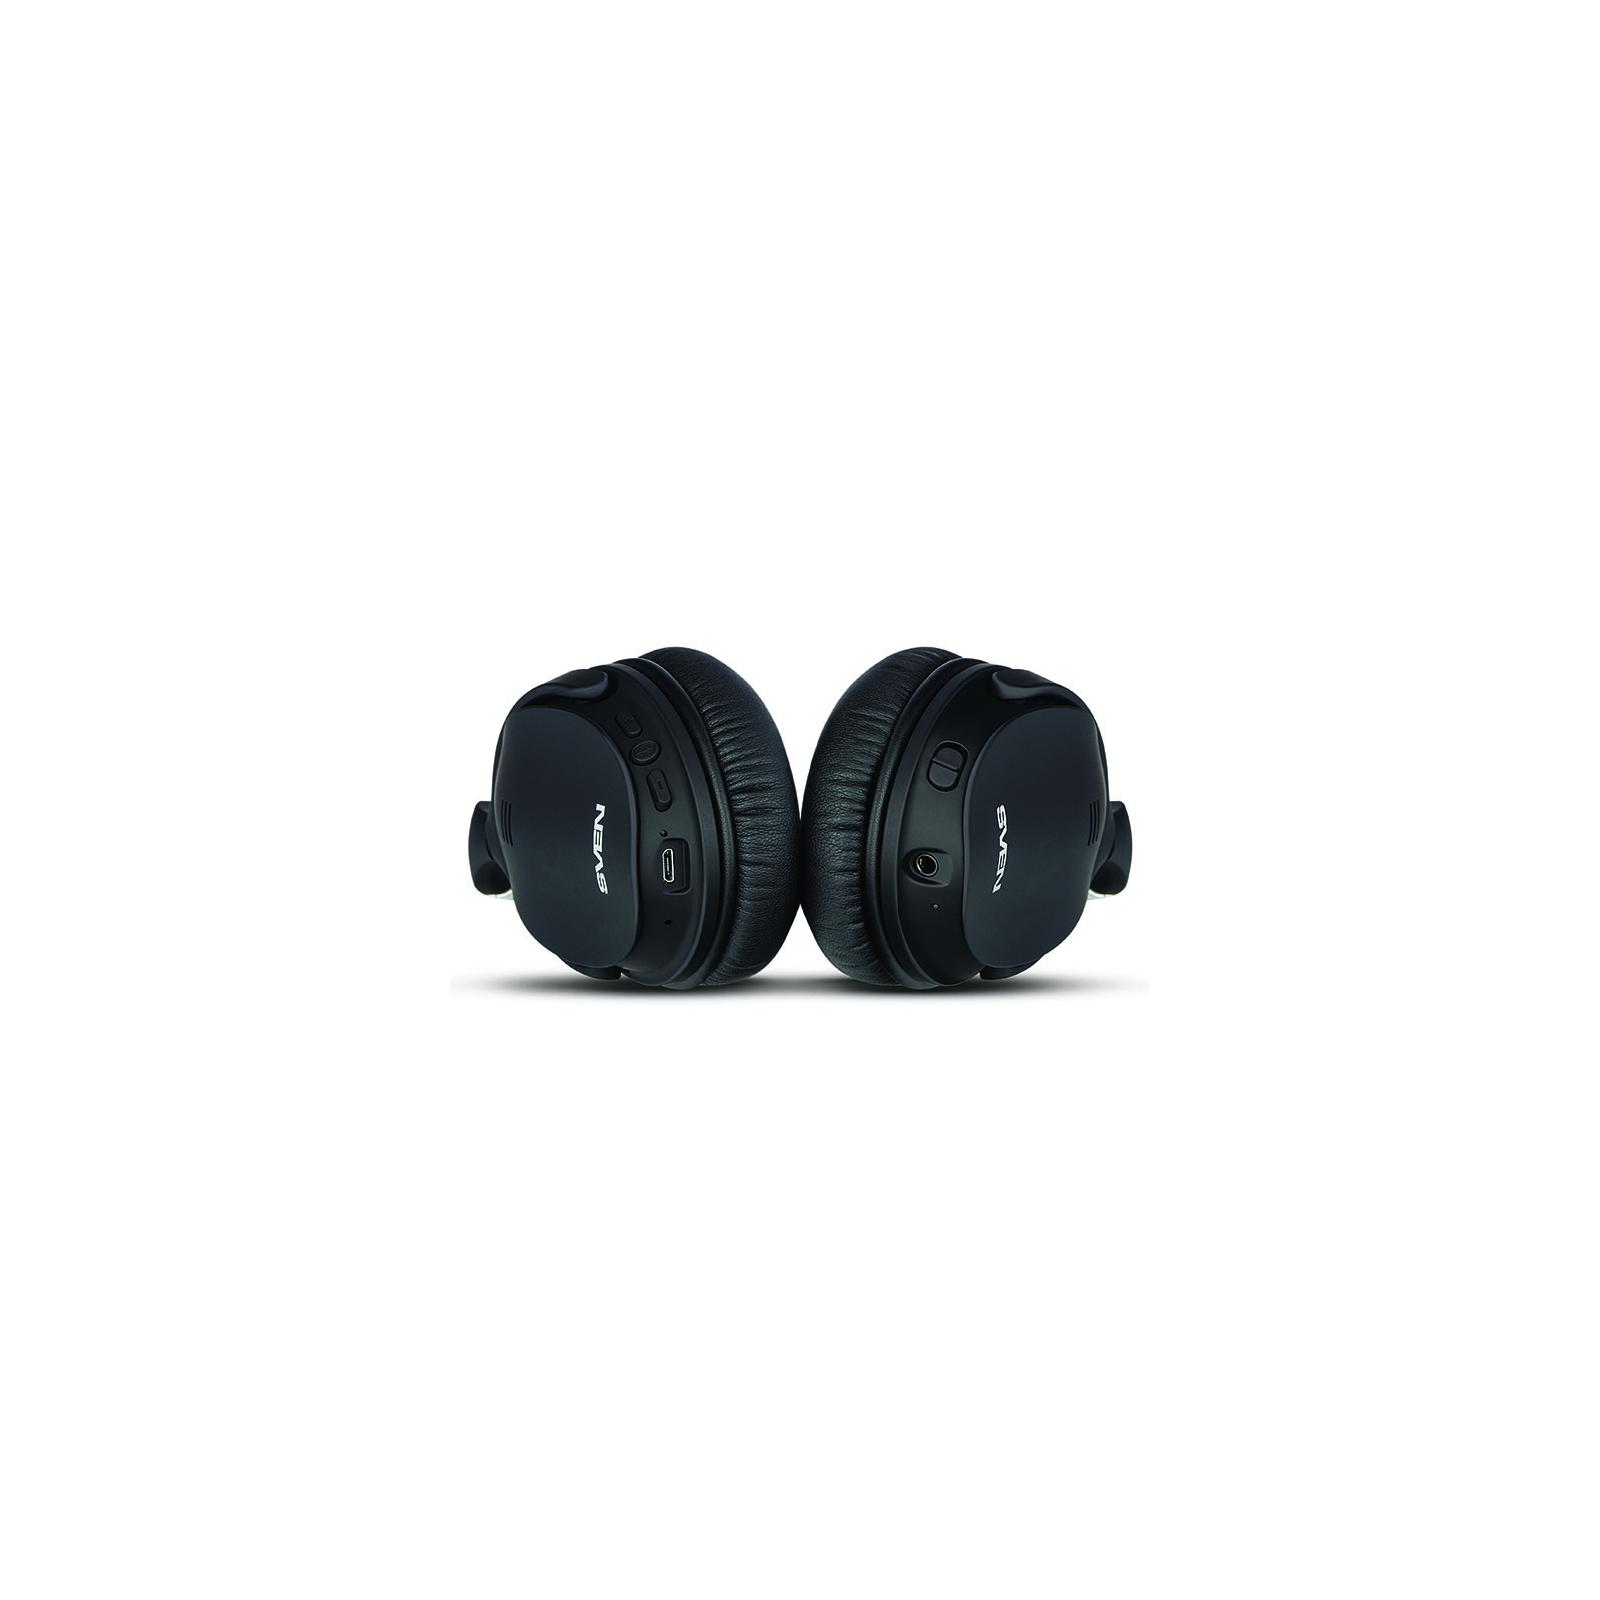 Наушники Sven AP-B900MV Black Bluetooth (AP-B900MV black) изображение 5